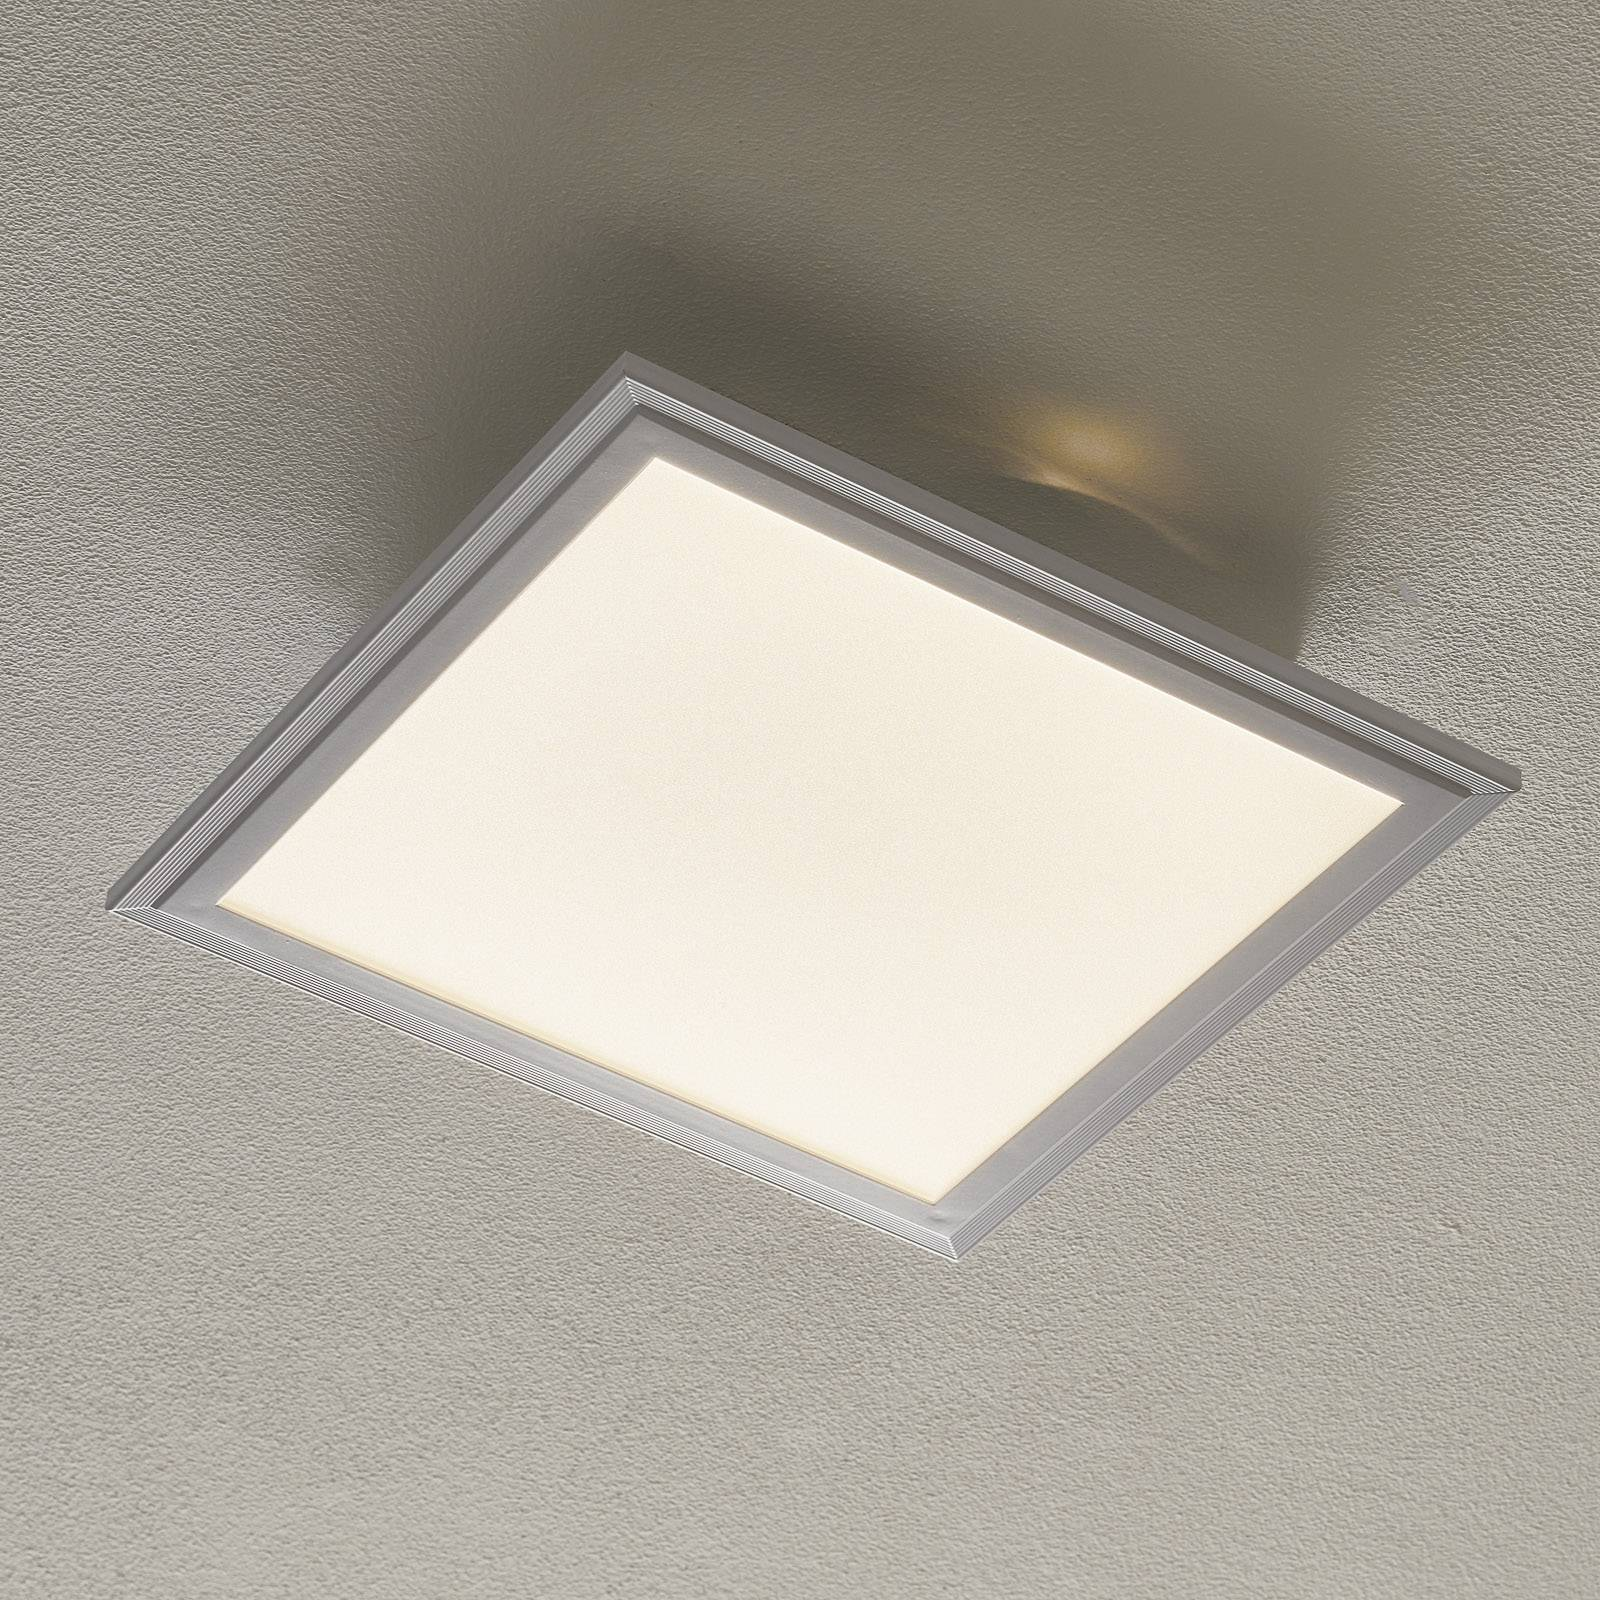 EGLO connect Salobrena-C LED-paneeli, 30 x 30 cm